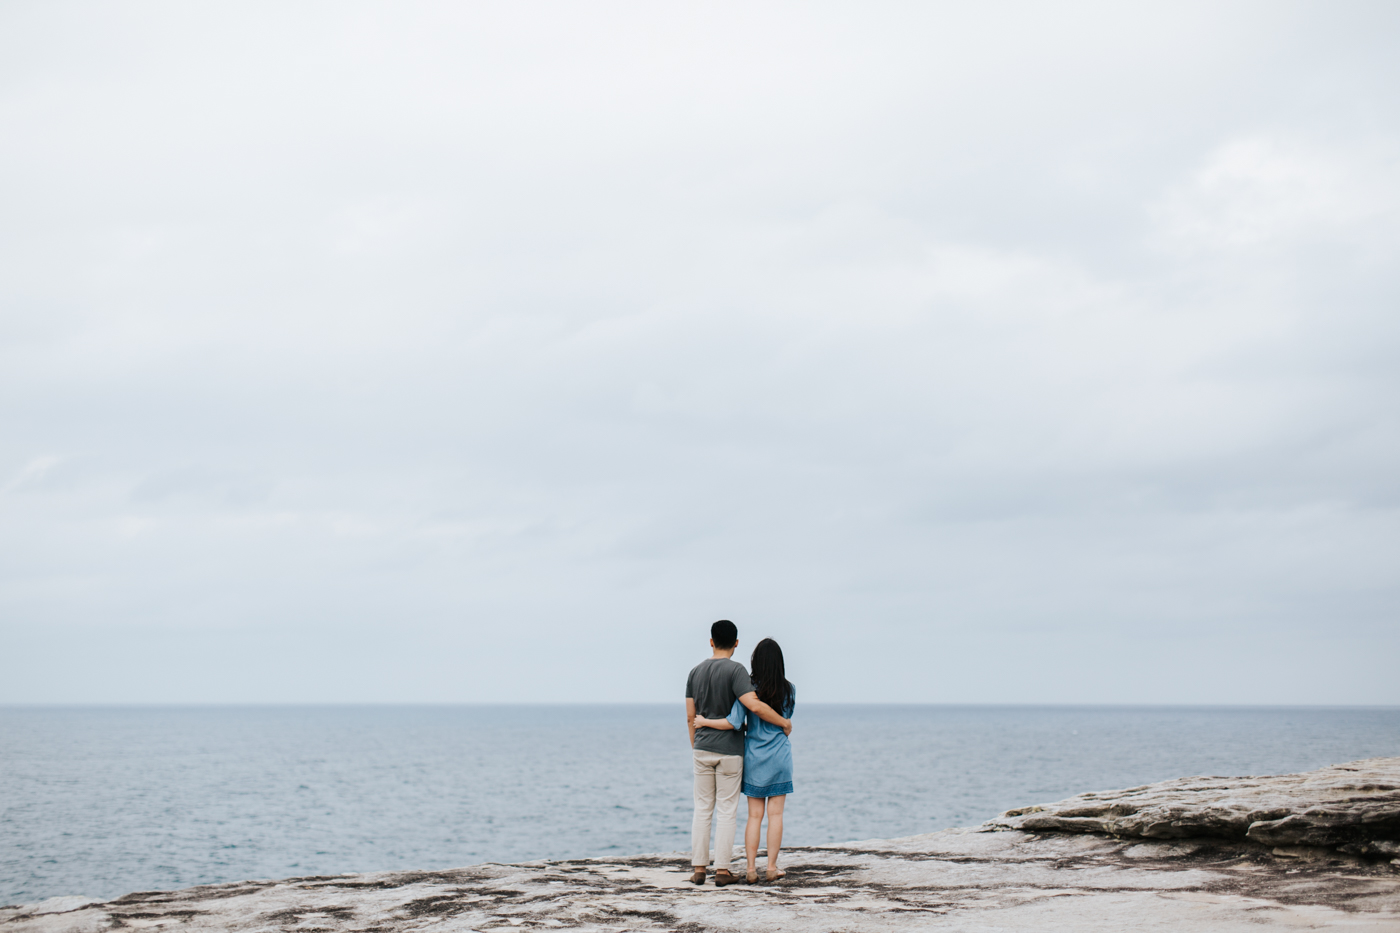 Lishien & Jason Engagement - Kurnell Cliffs - Samantha Heather Photography-15.jpg